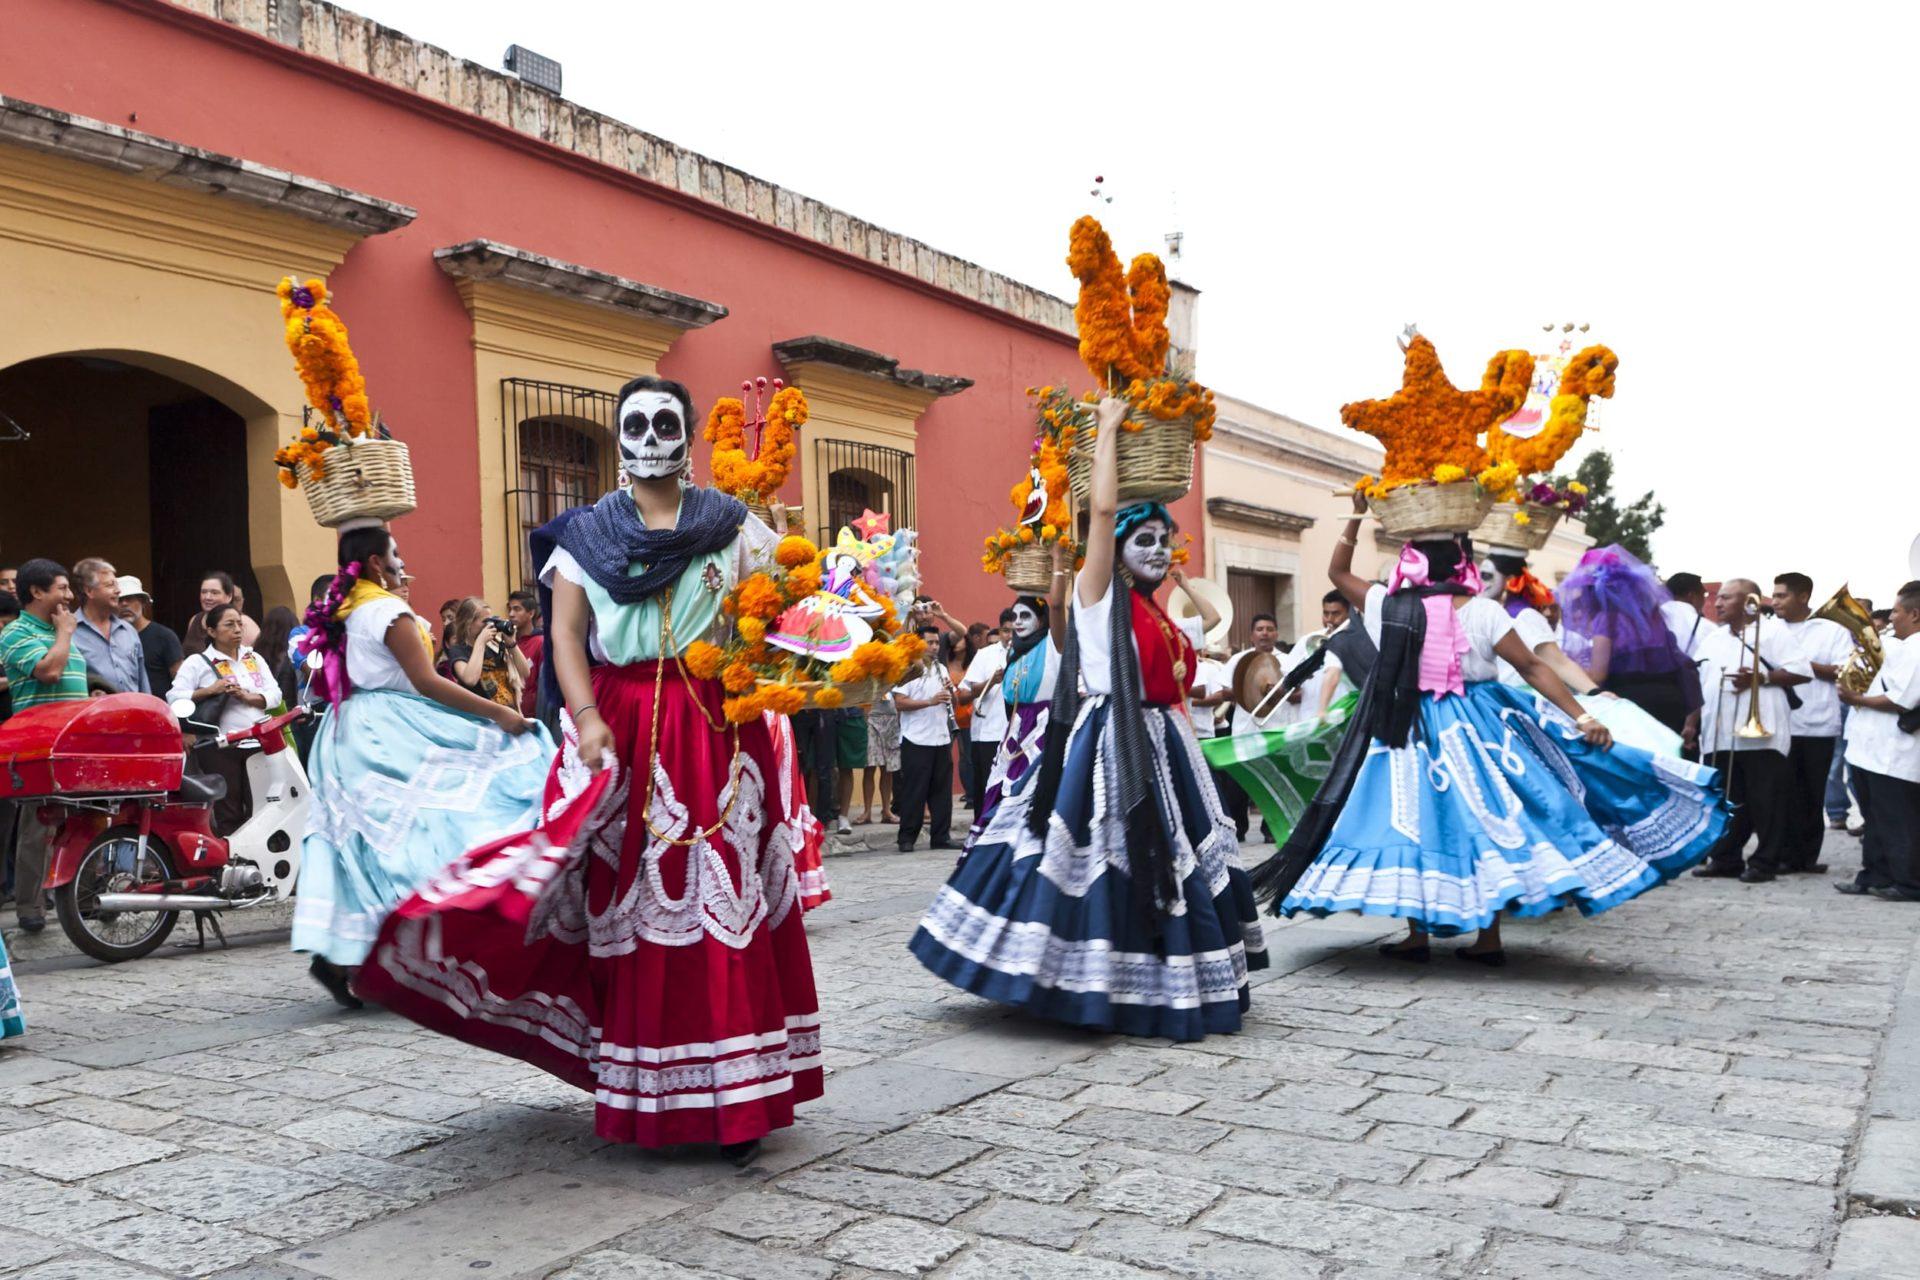 Día de los Muertos - unsere Ausgehtipps für Leipzig! - Mexico Mio